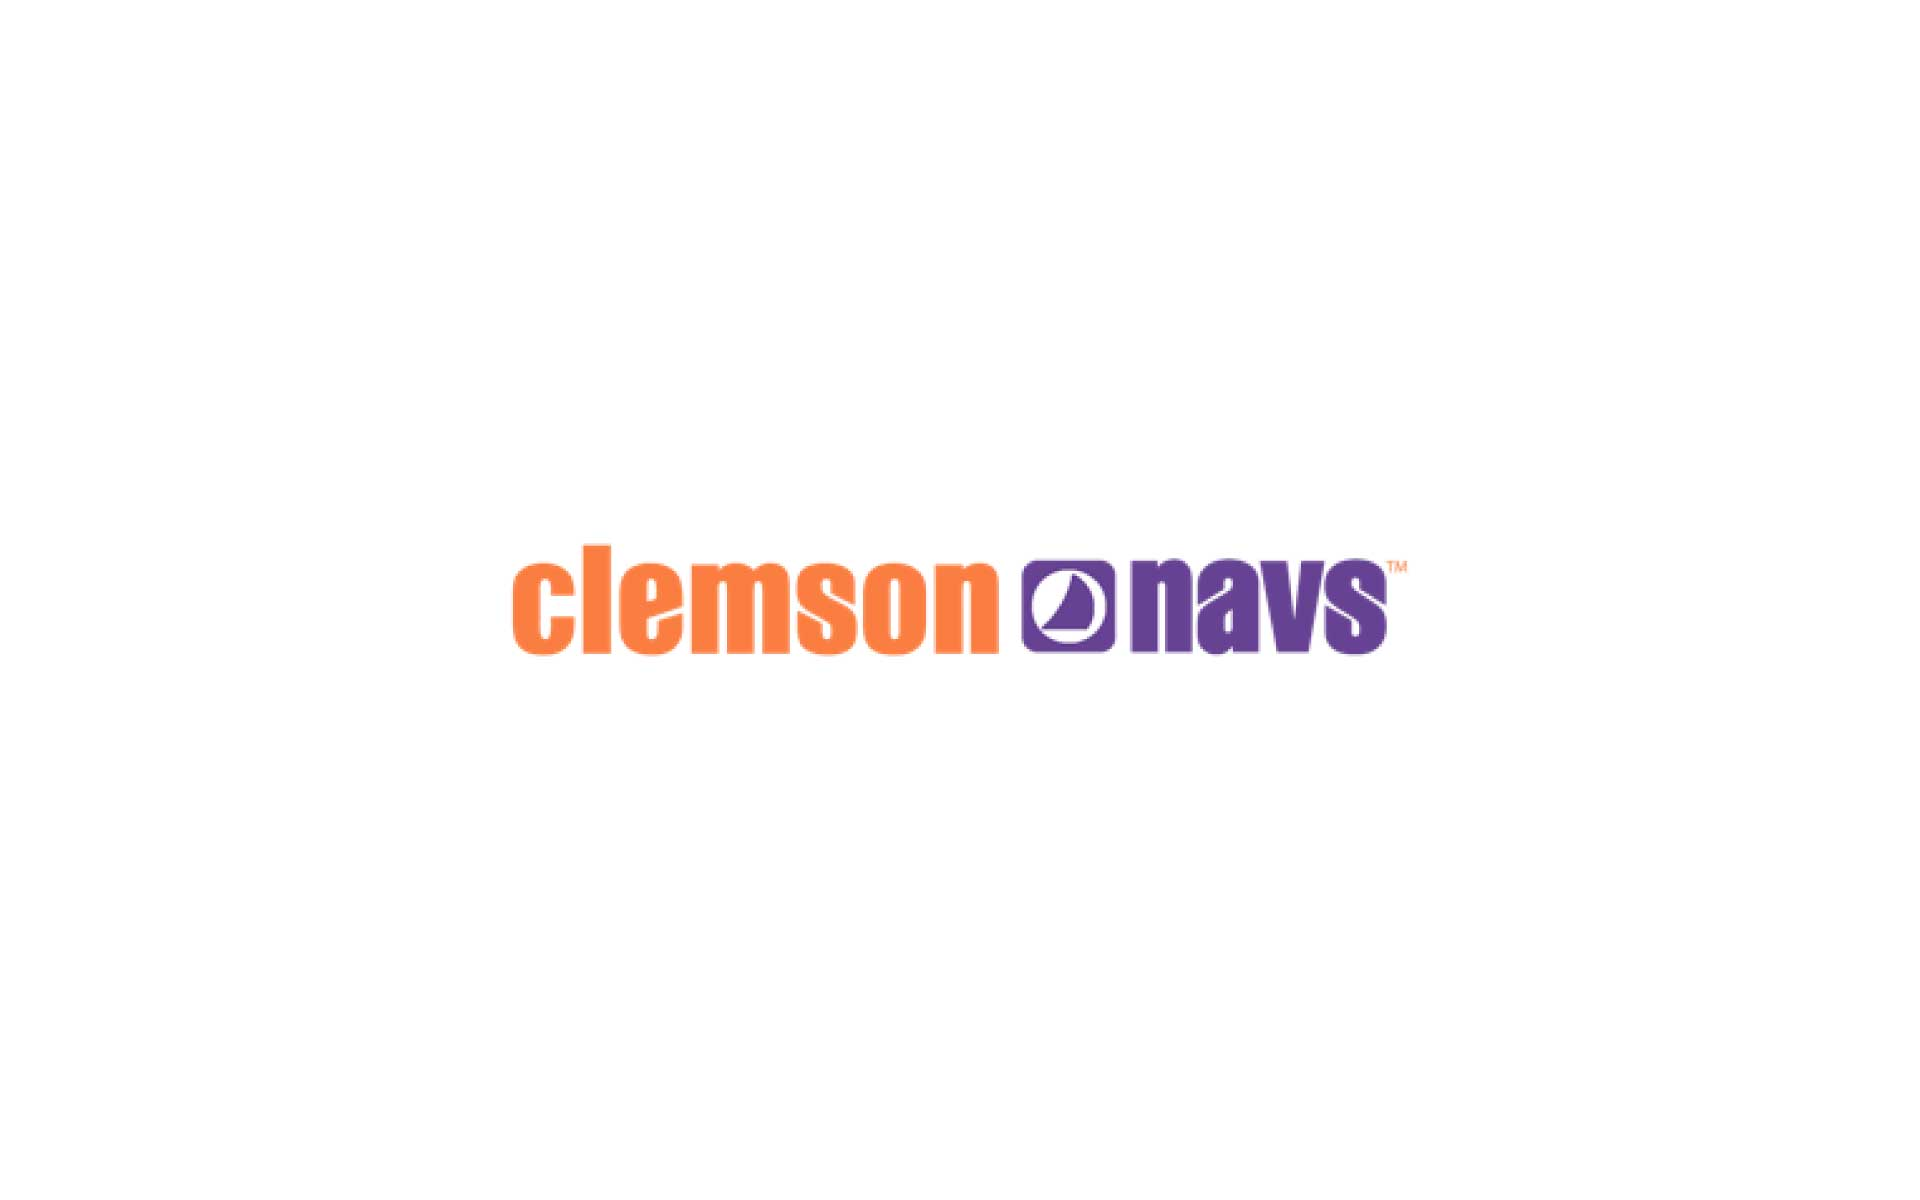 Clemson Navigators